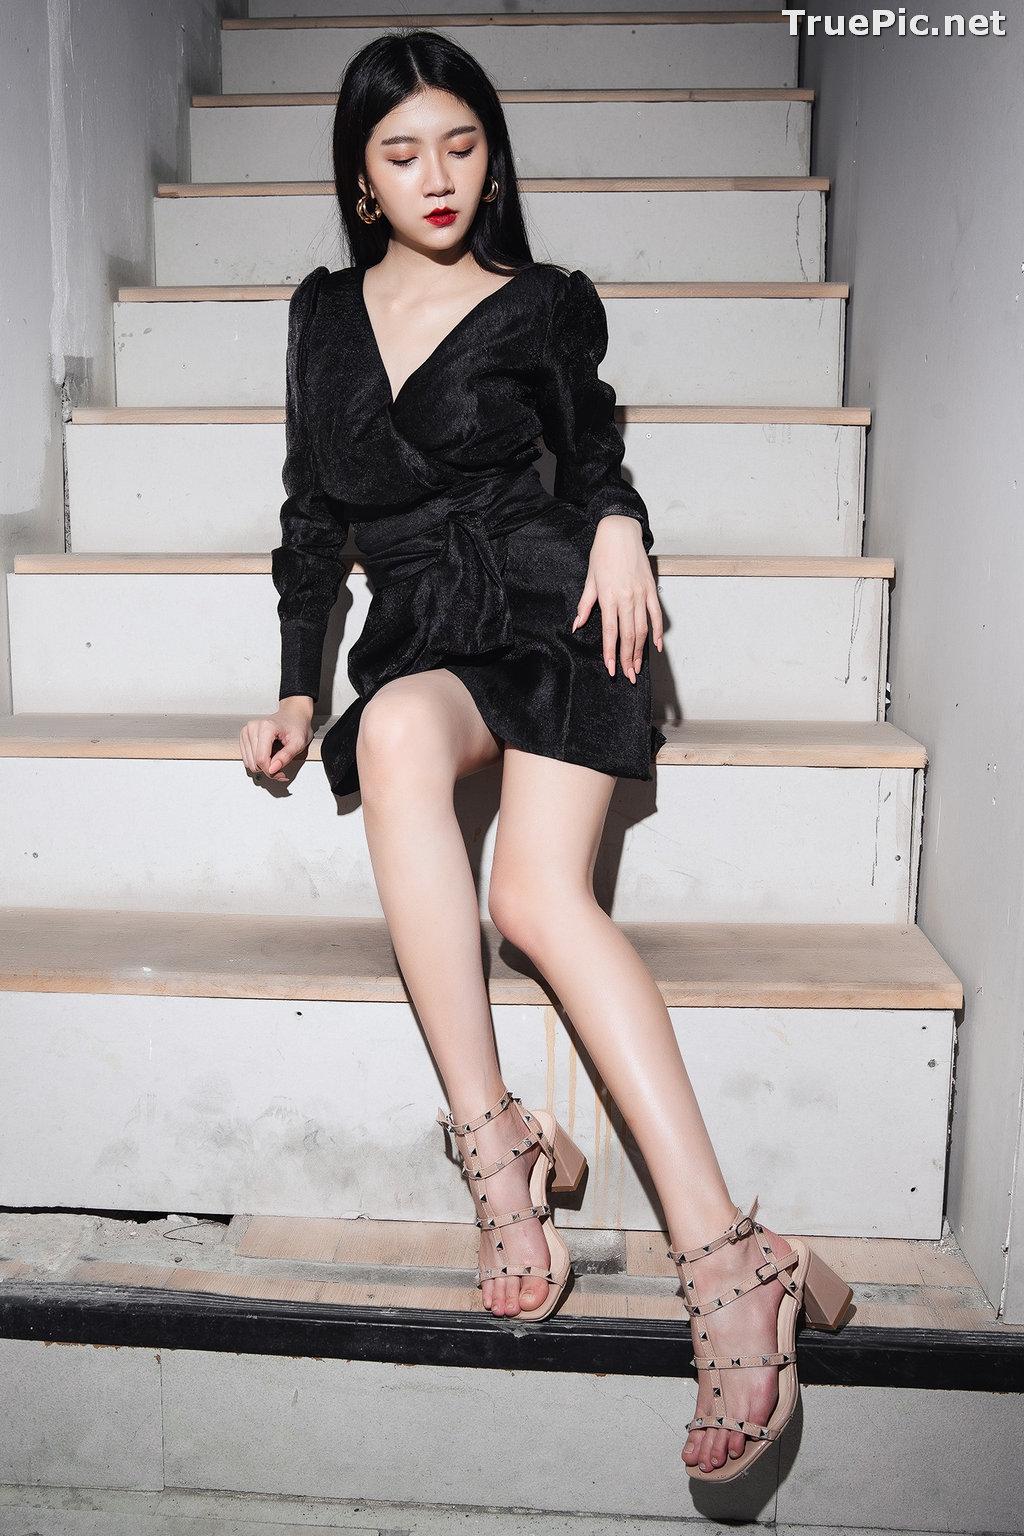 Image Thailand Model - Sasi Ngiunwan - Black For SiamNight - TruePic.net - Picture-7